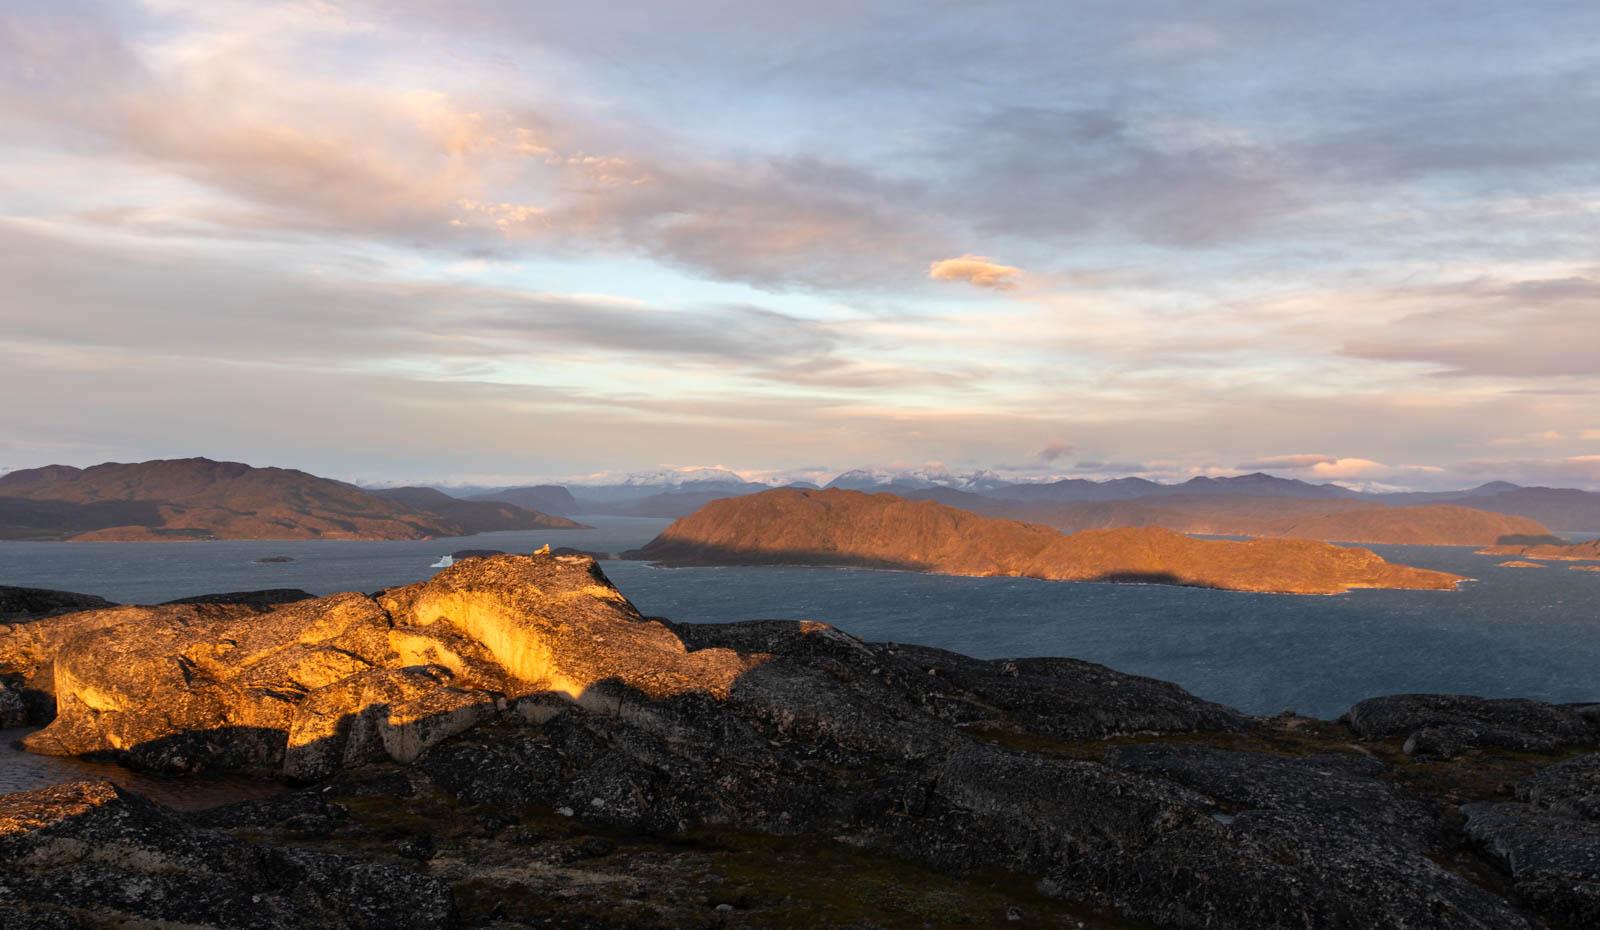 Sonnenuntergang in Qaqortoq, Grönland